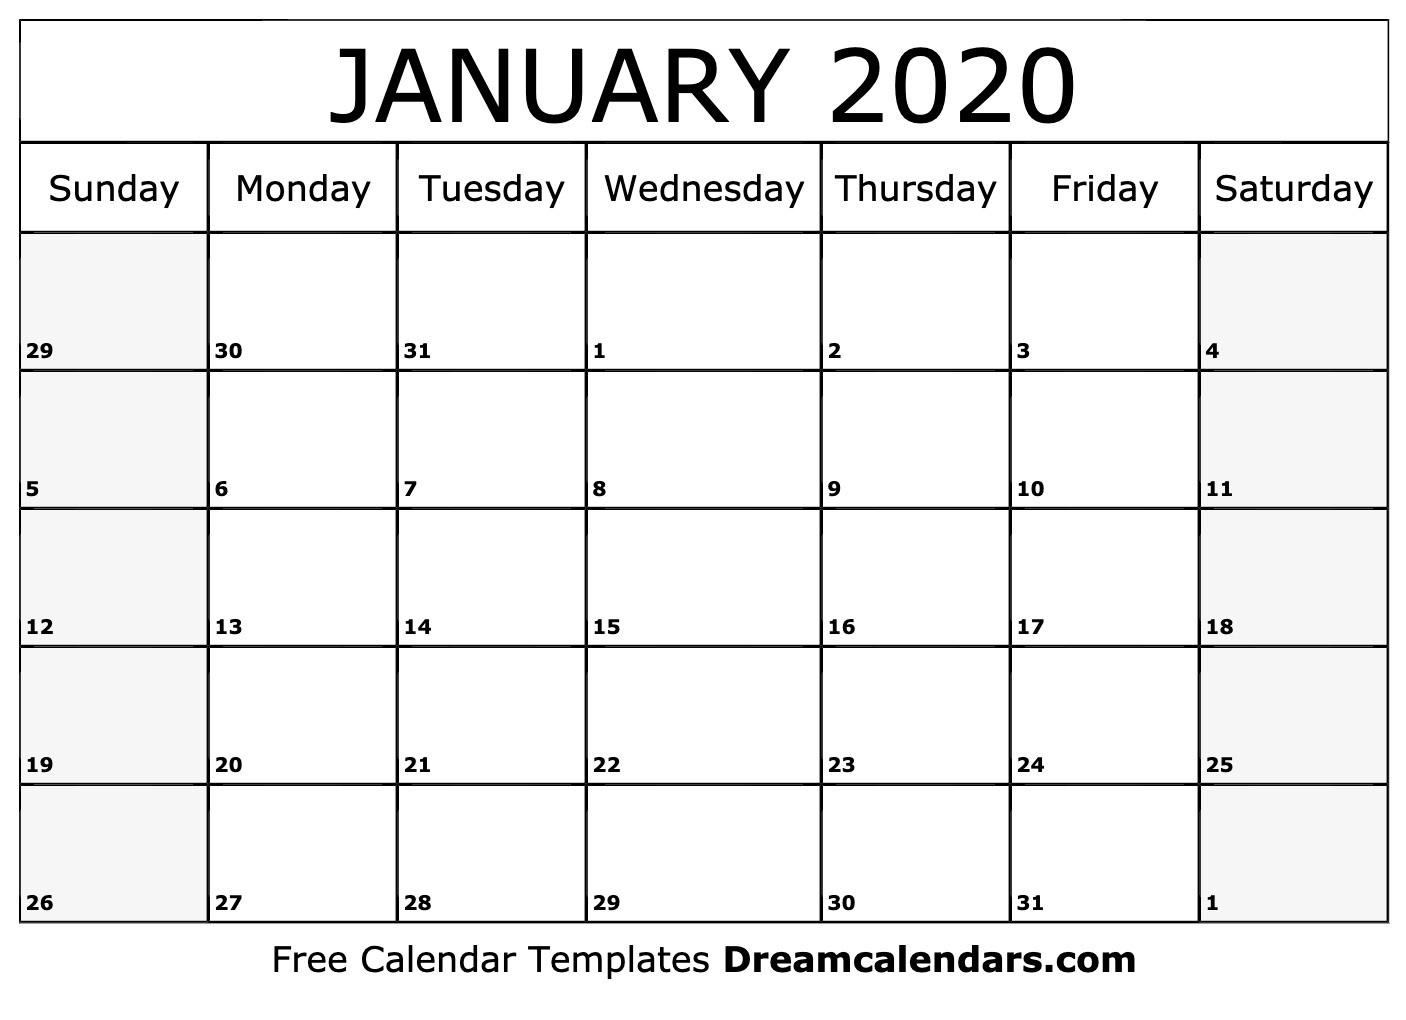 Printable January 2020 Calendar-January 2020 Calendar Template